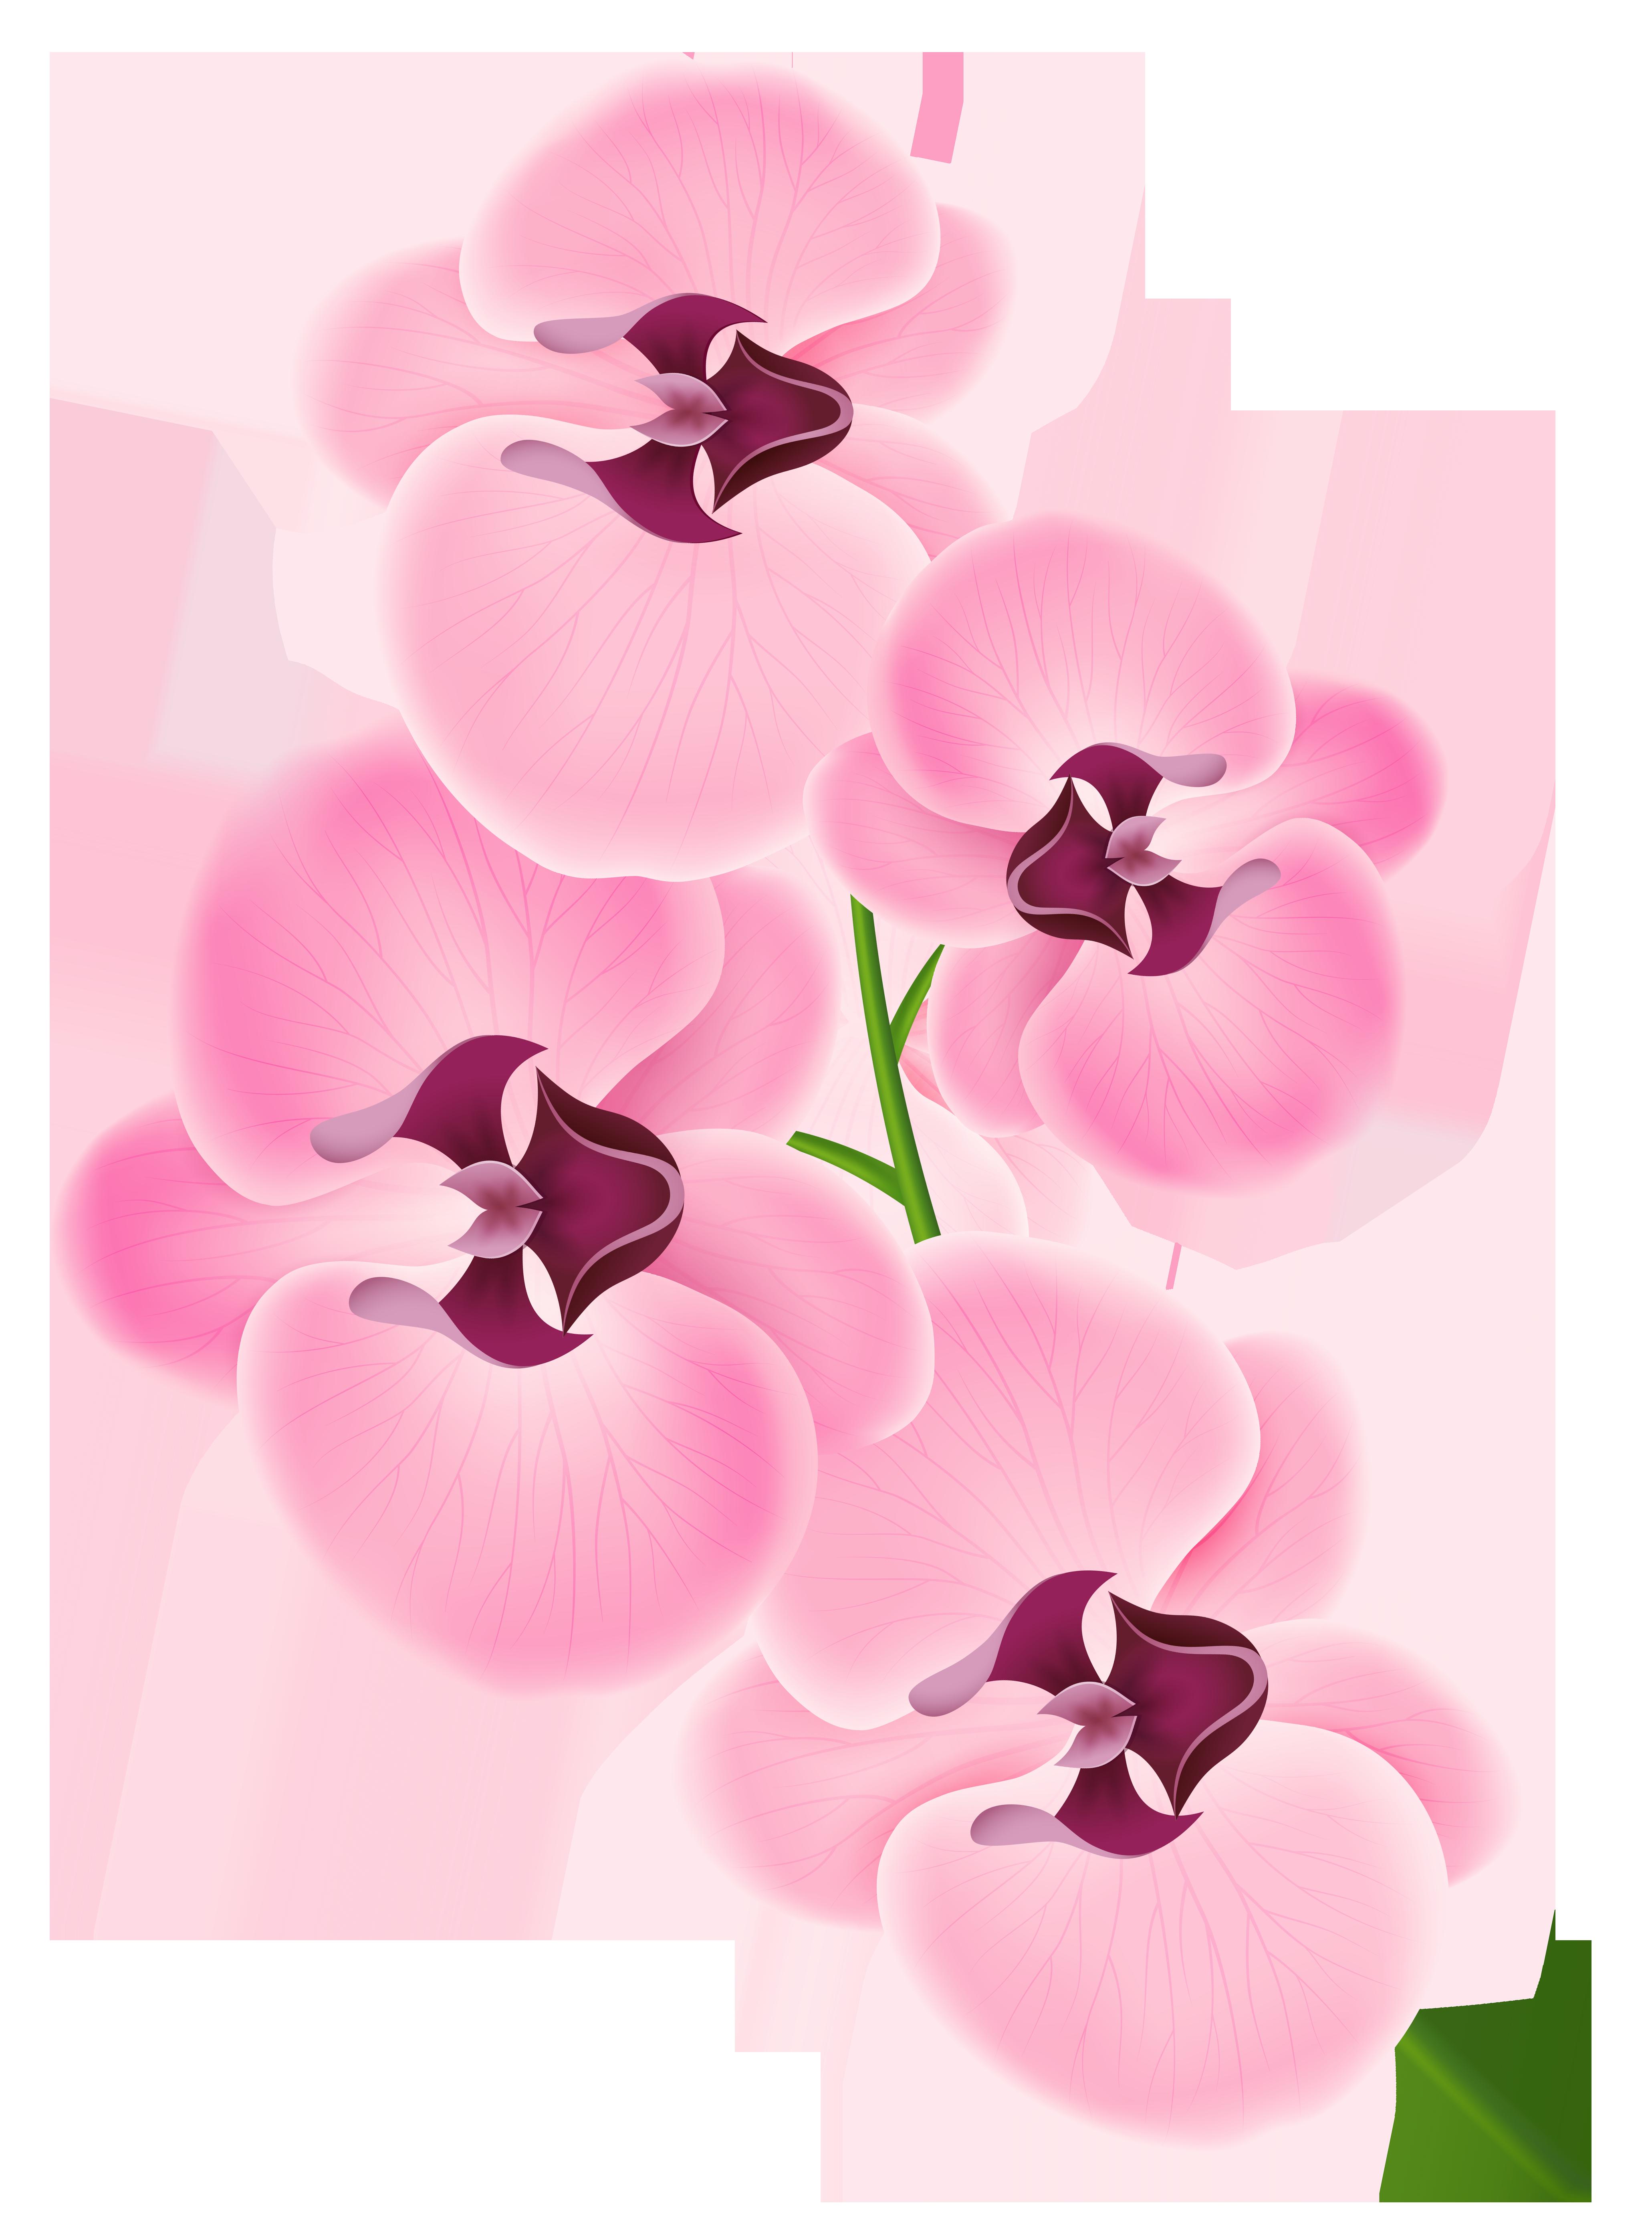 Floral clipart orchid. Png google cuba party